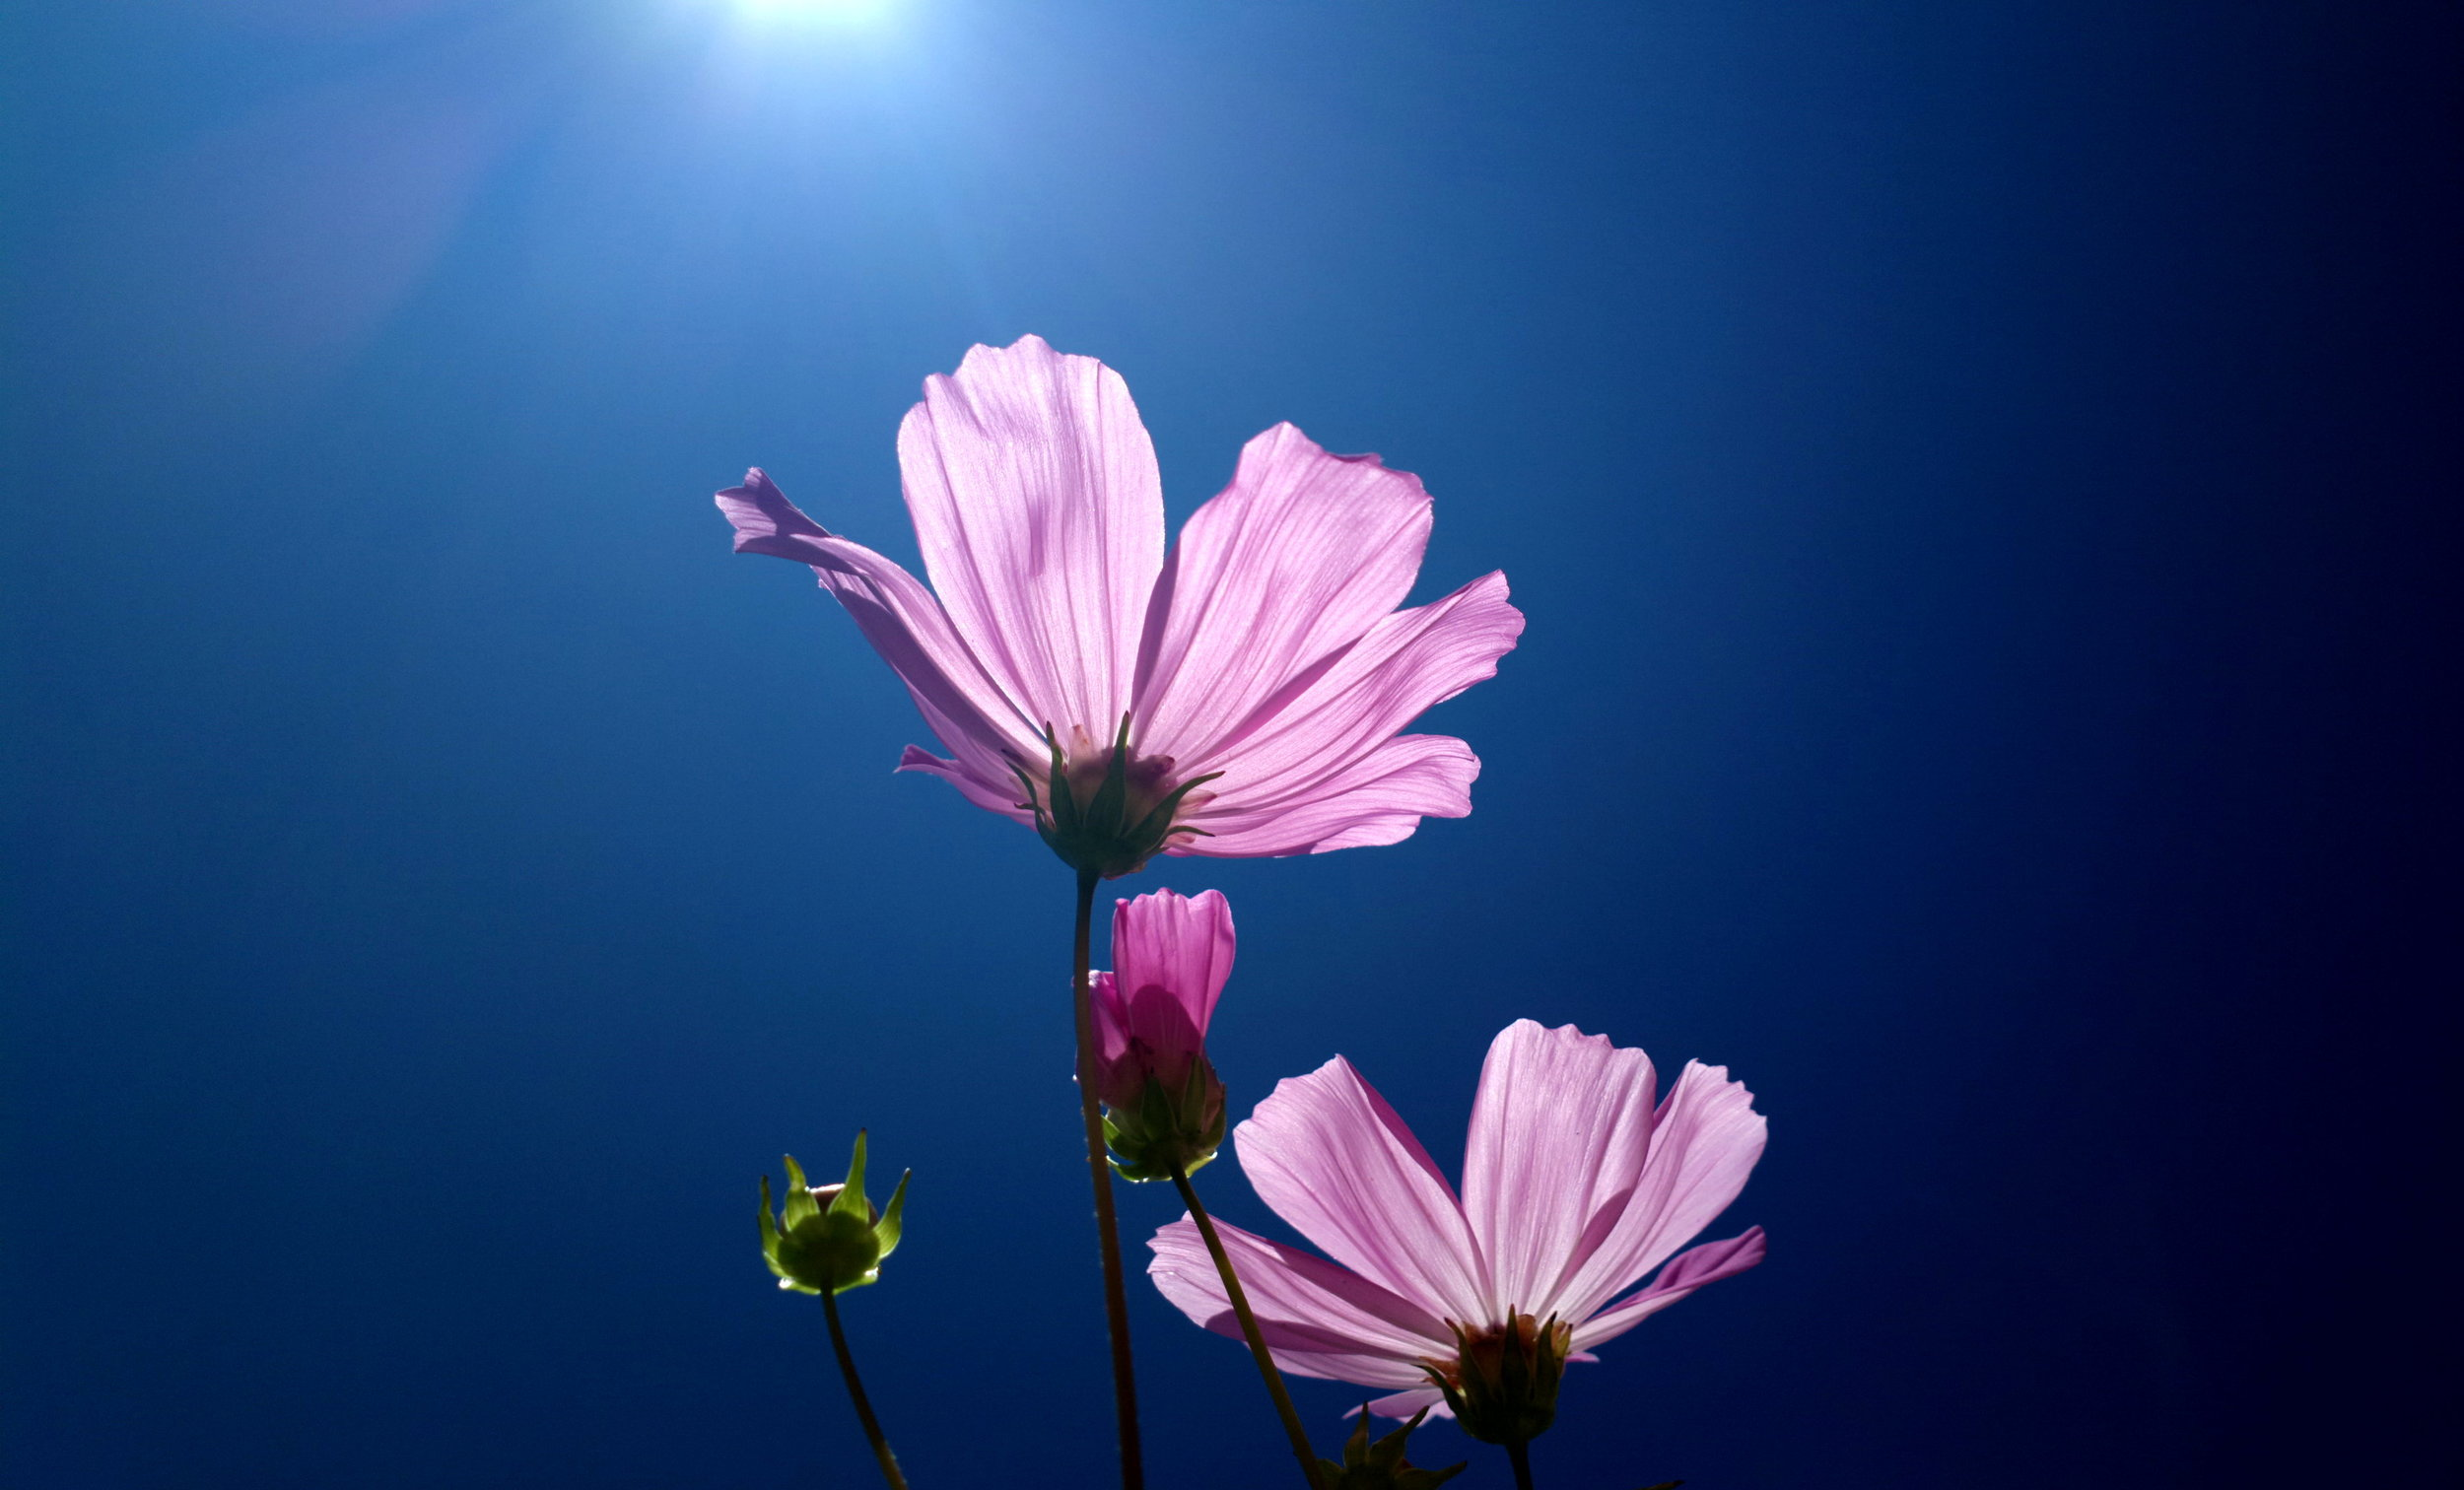 """Flower"" by Flickr User solarisgirl. CC BY-SA 2.0"